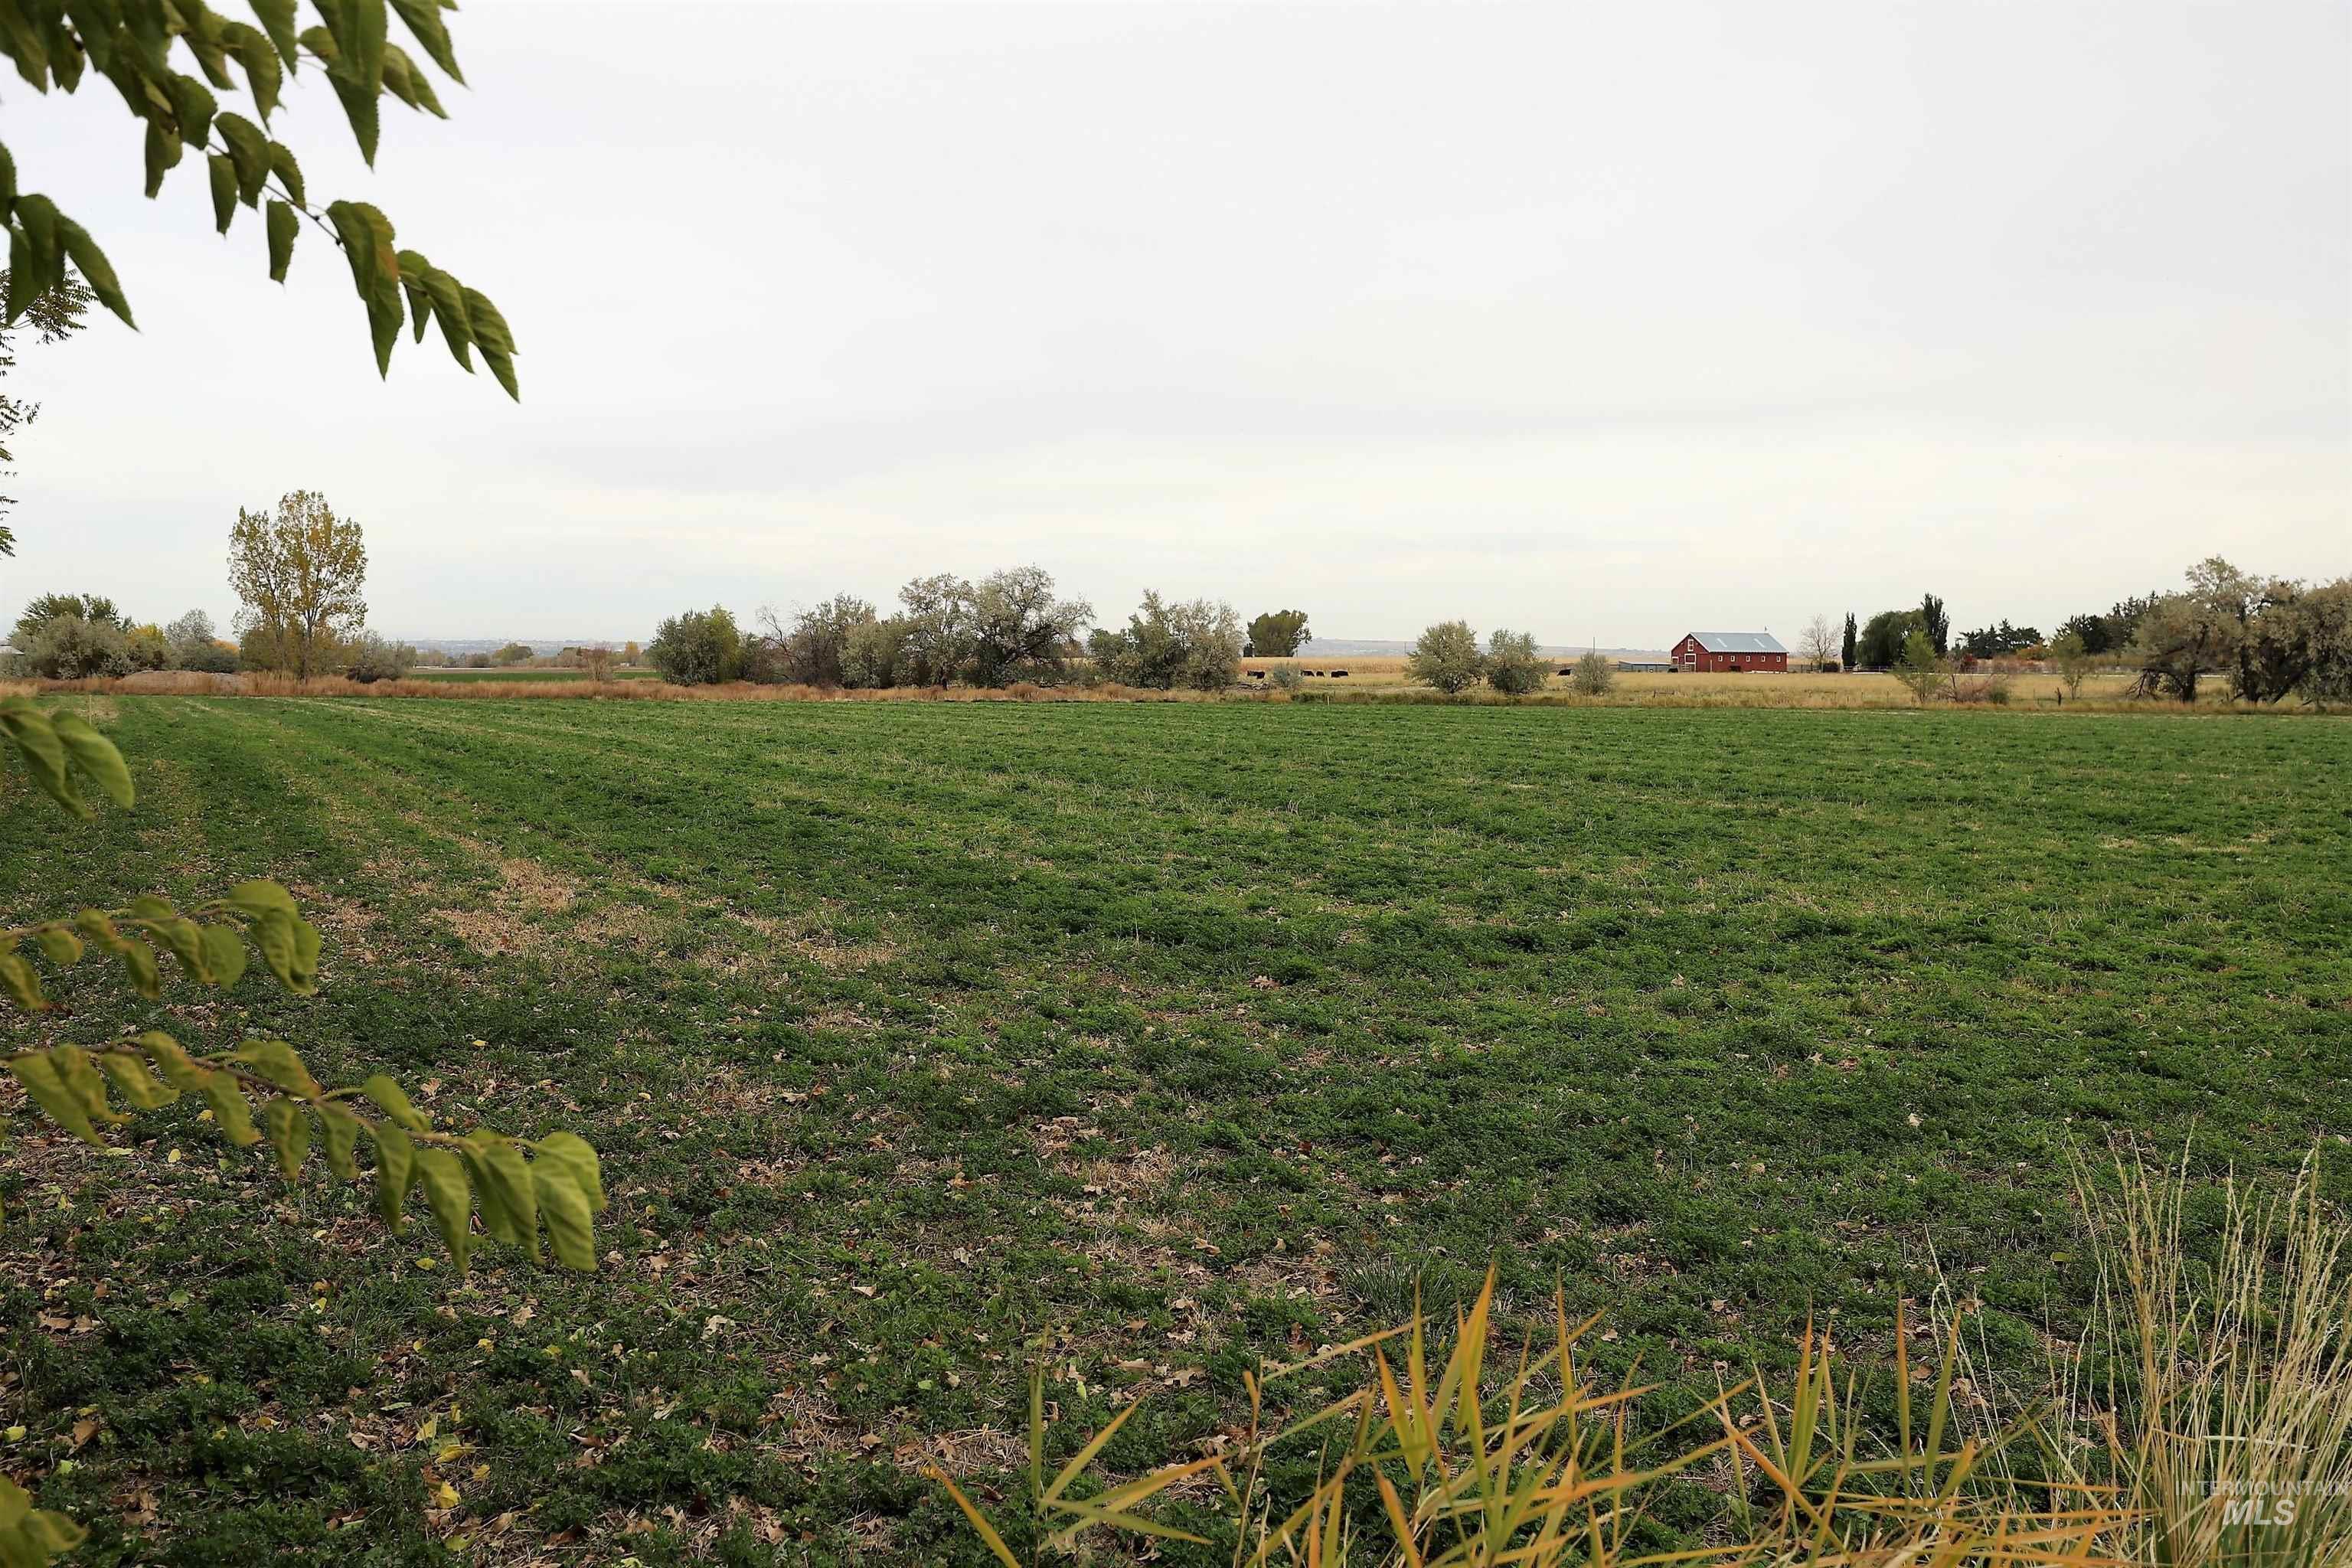 Tbd 3800 N. Property Photo 1